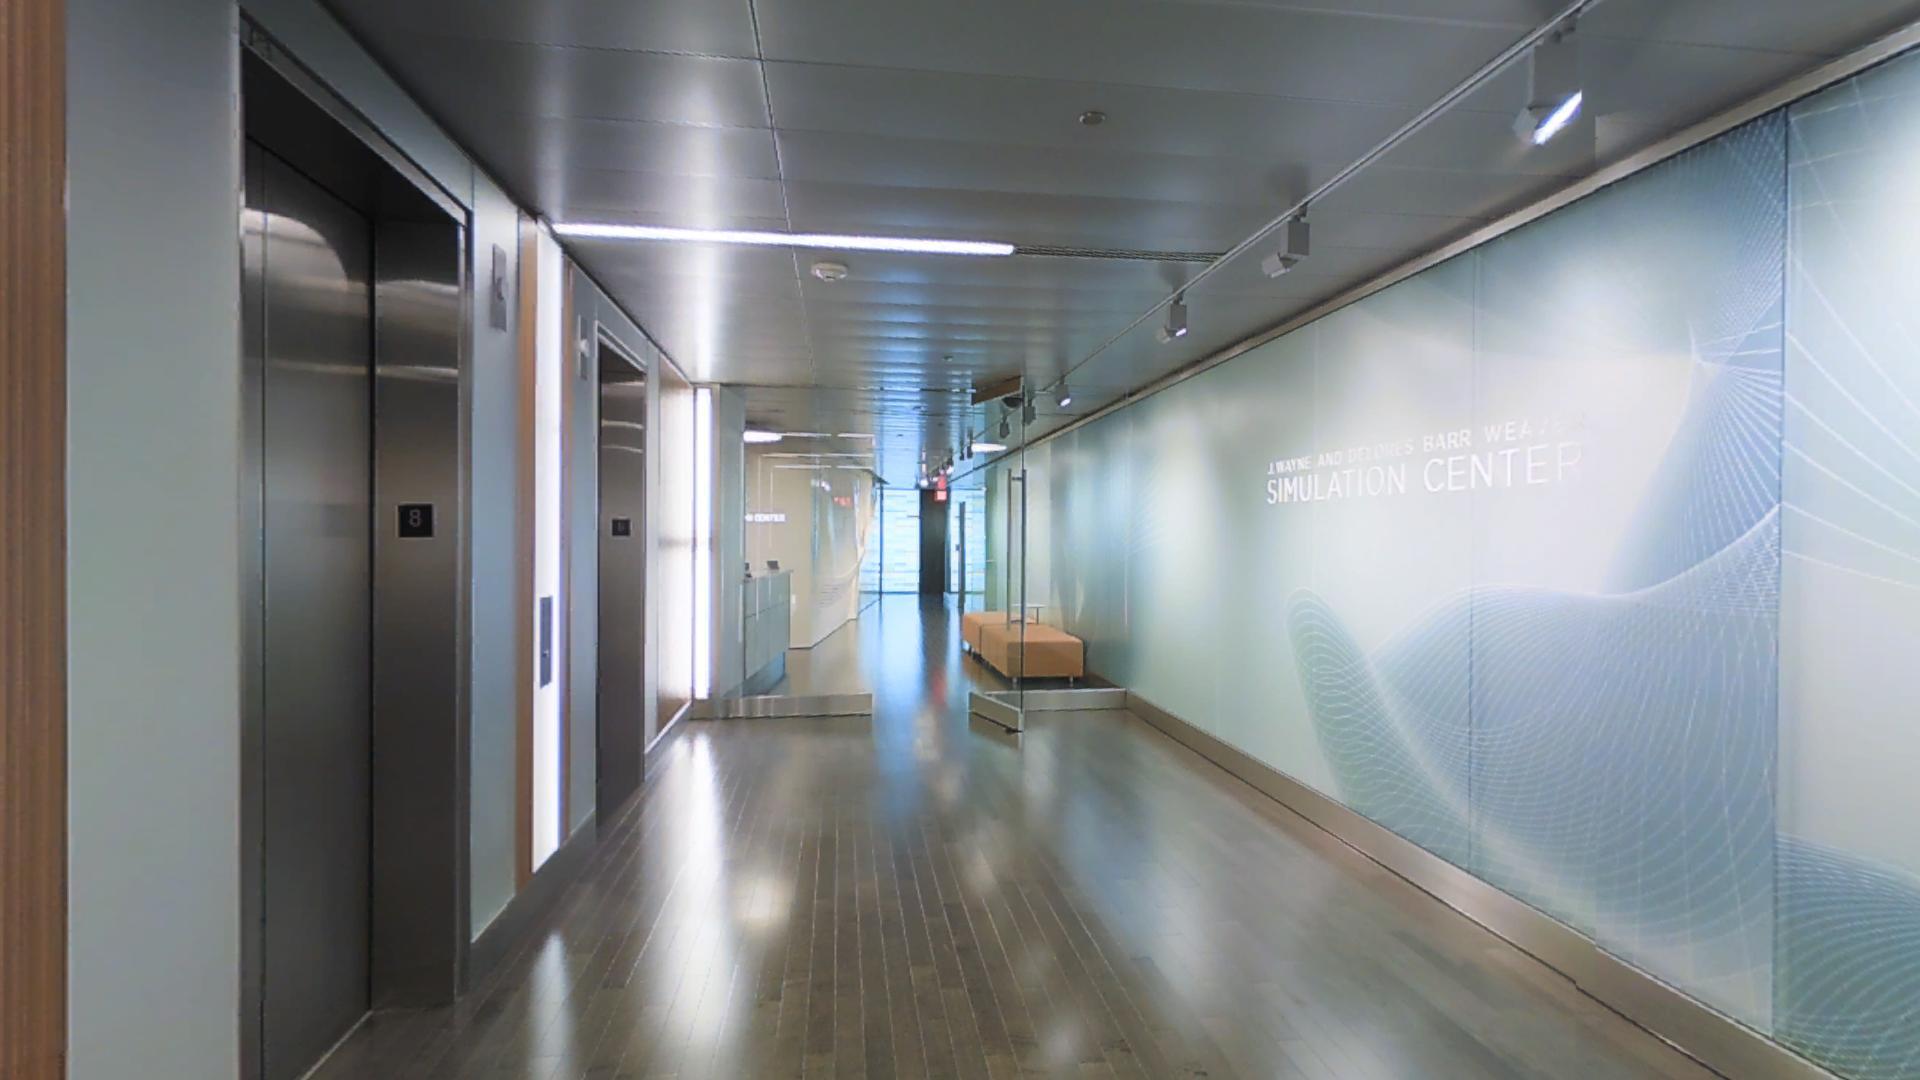 Mayo Clinic Simulation Center